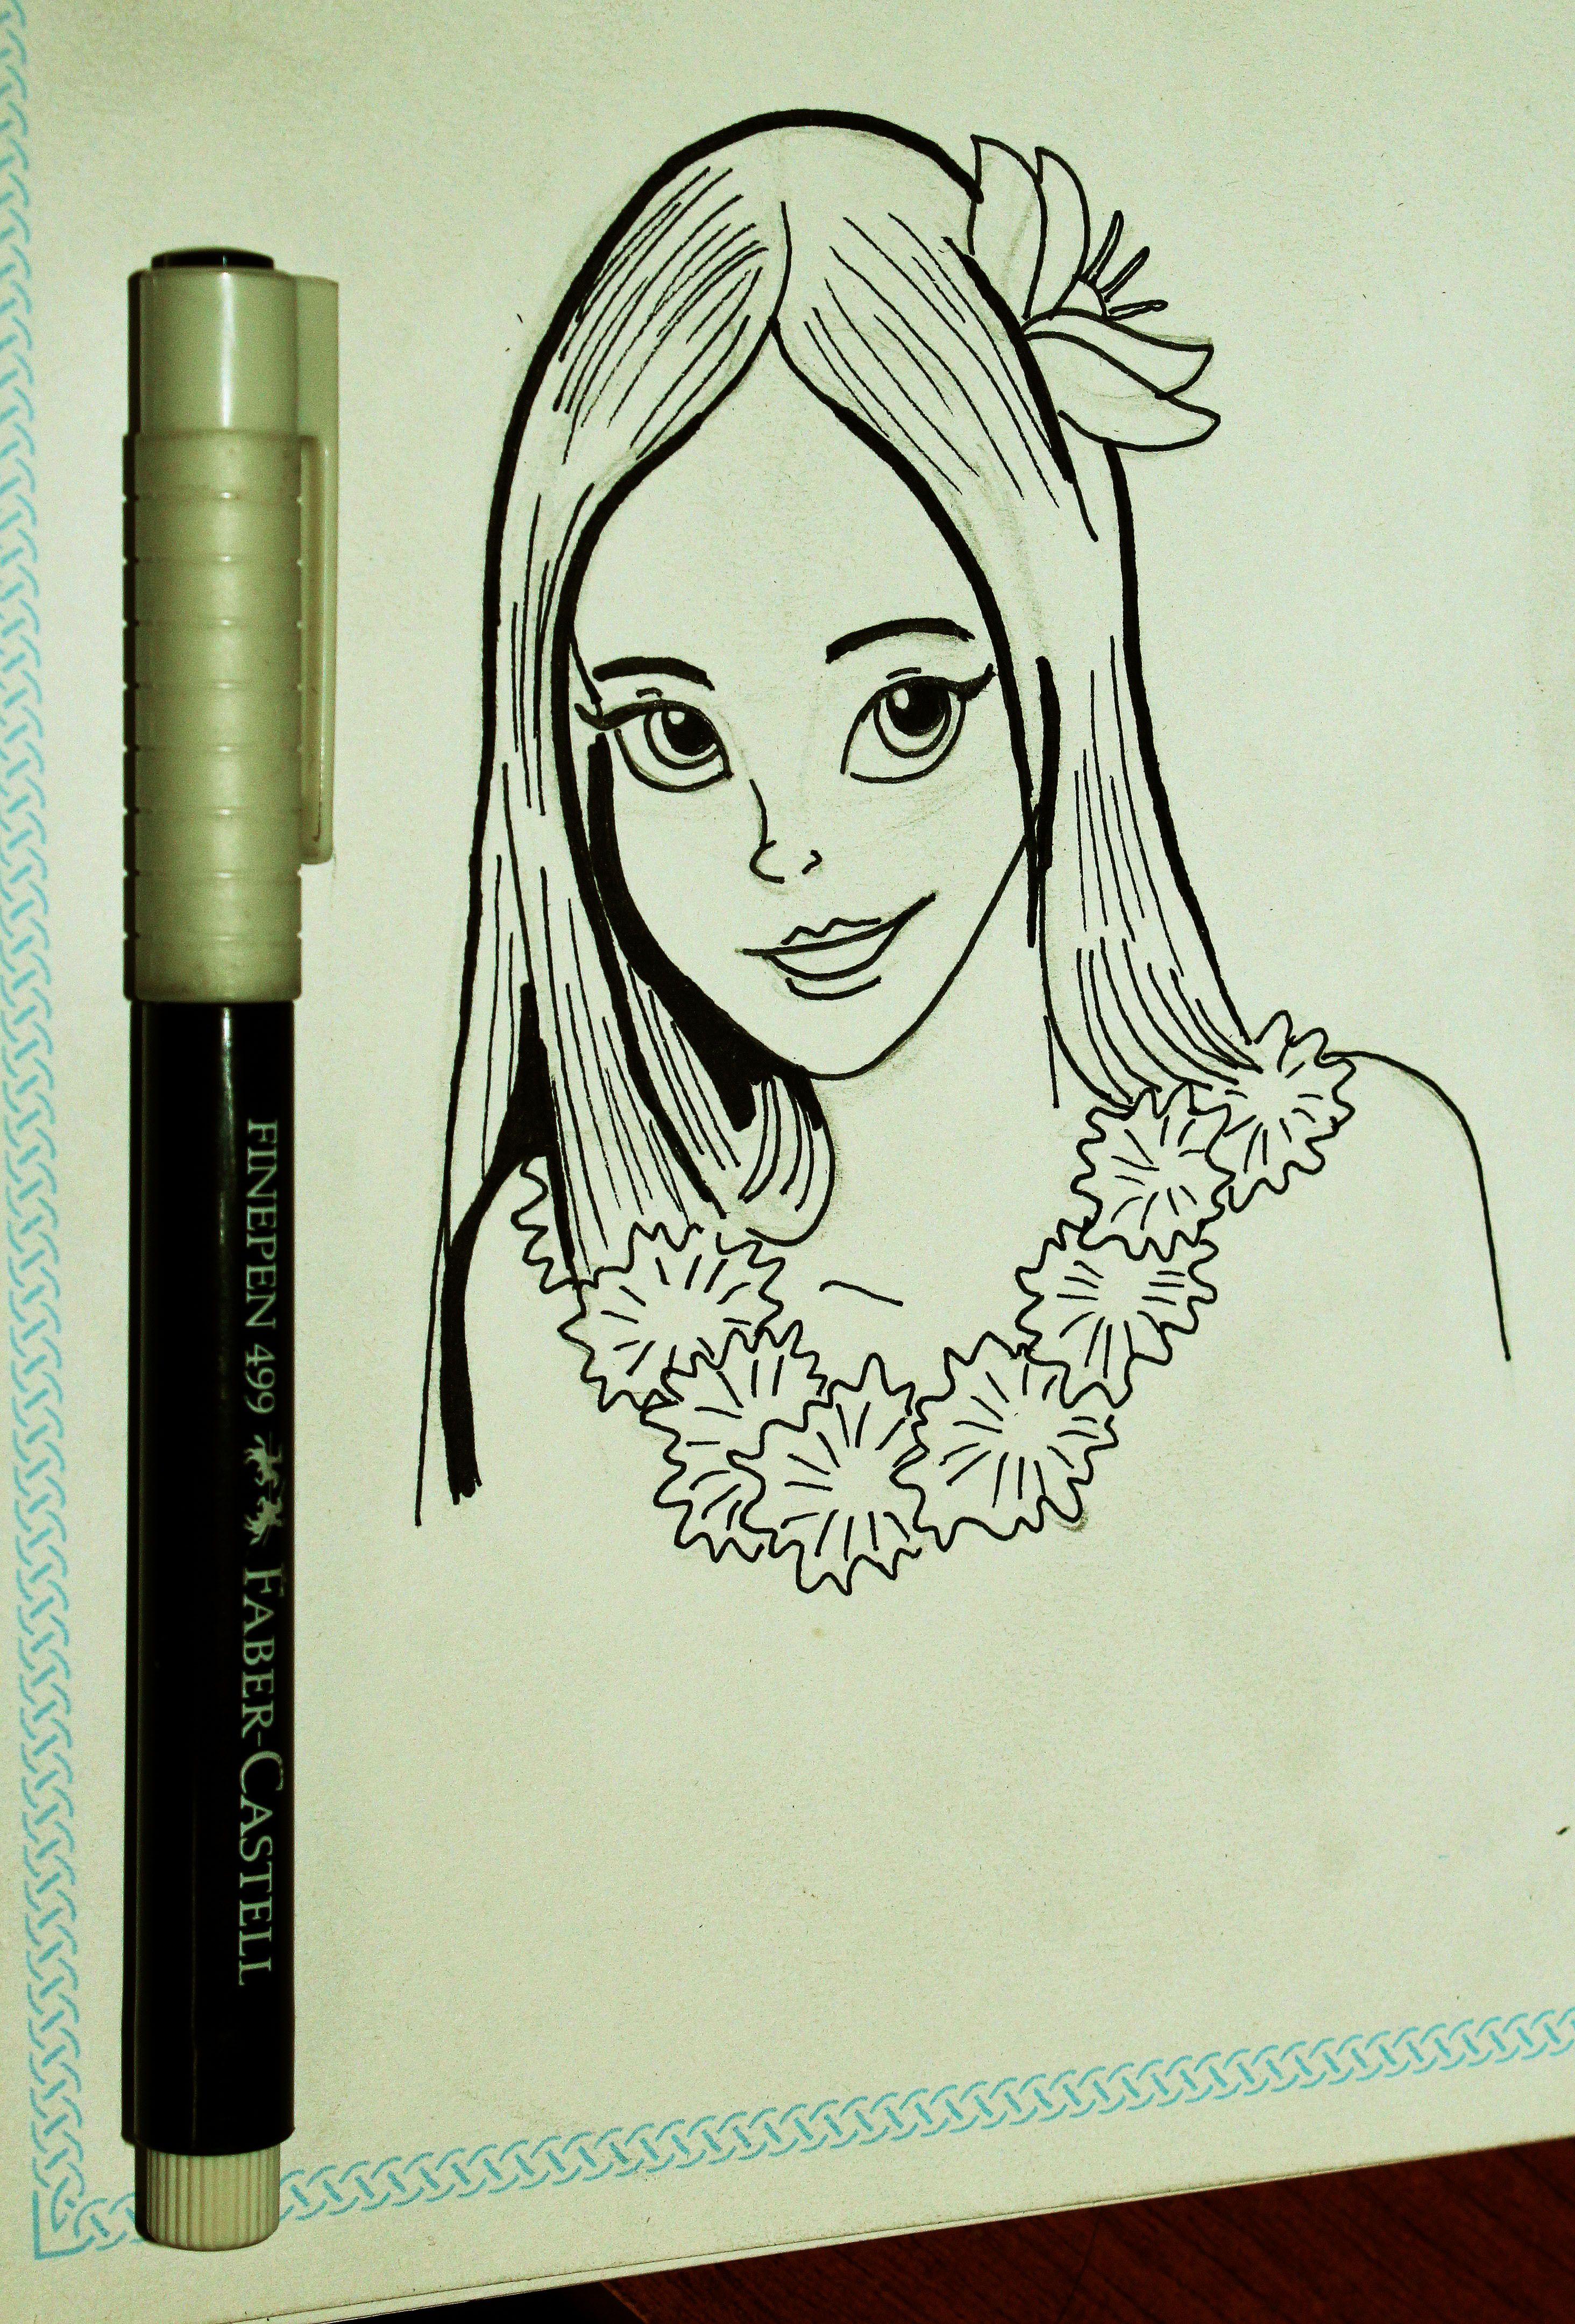 Nina Hawaiana Art Line Female Sketch Art Photo